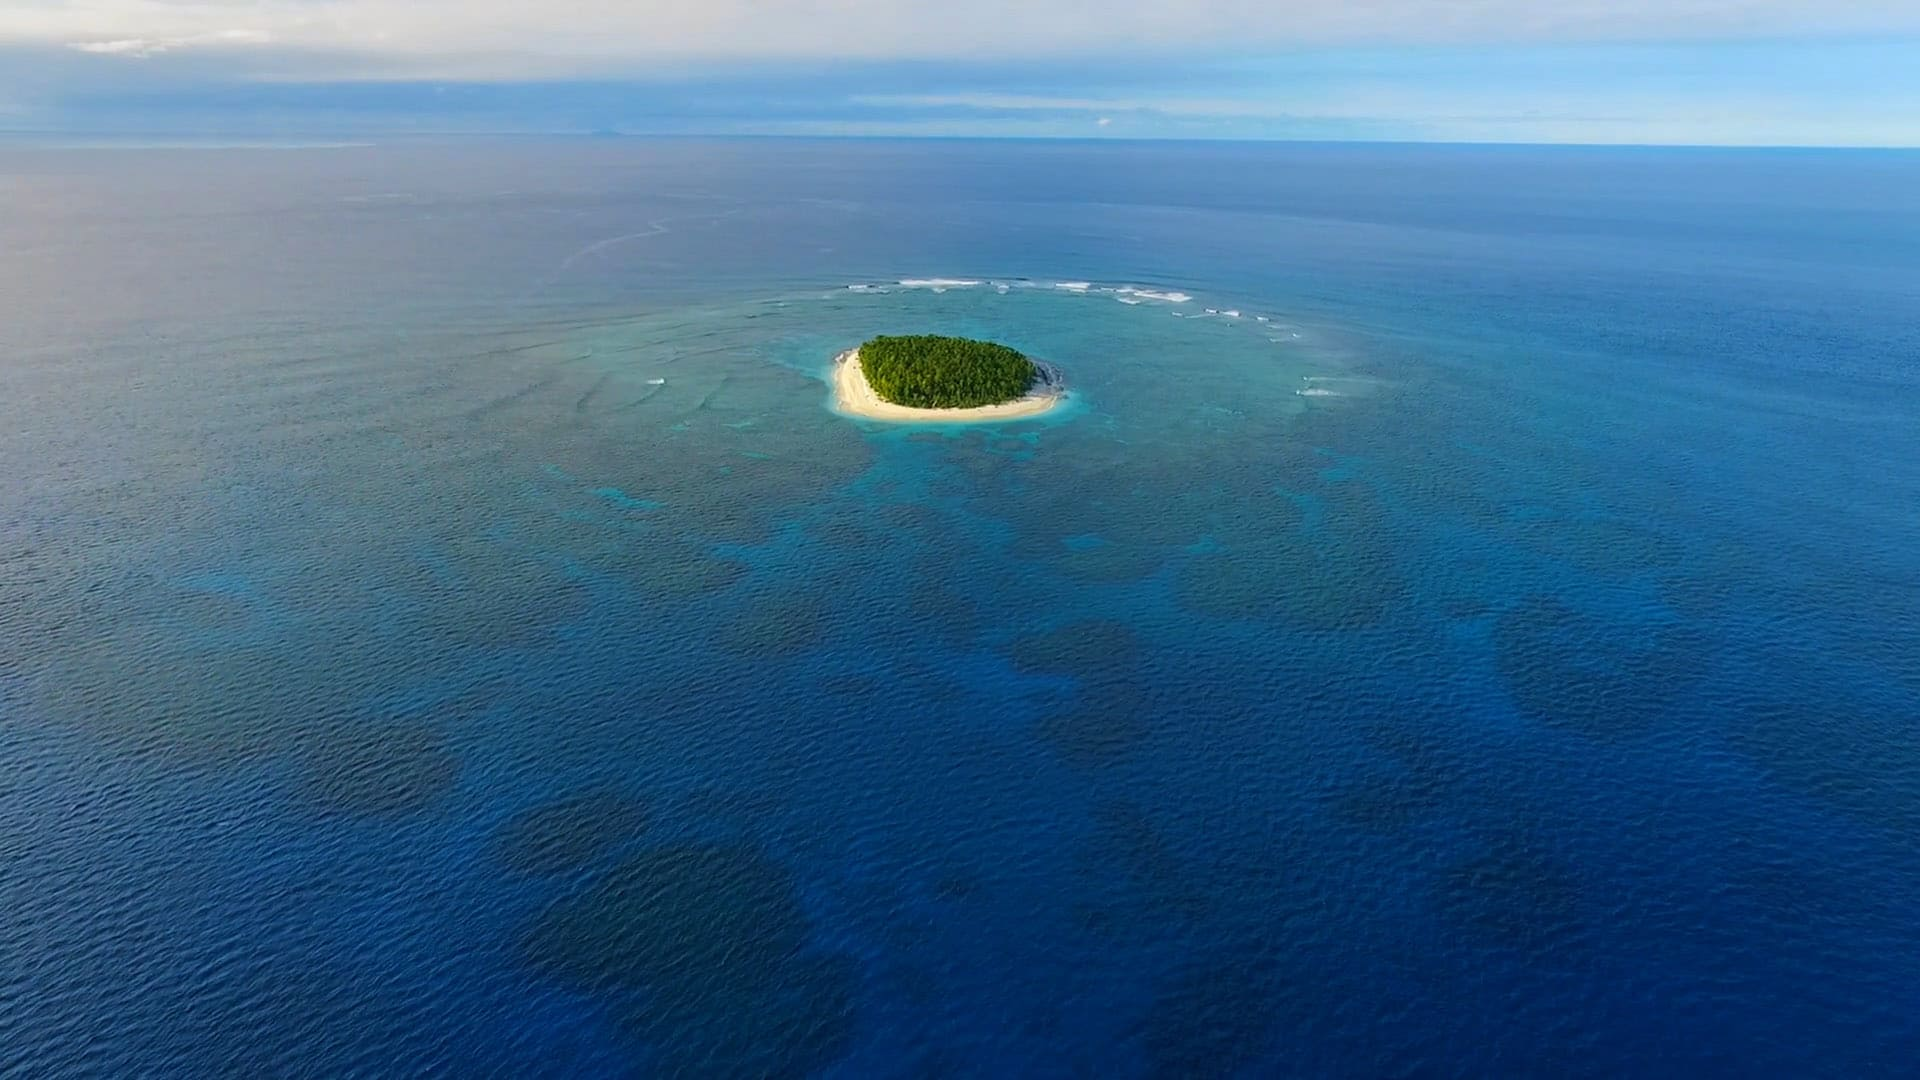 A remote desert island where our survivors enjoy alone